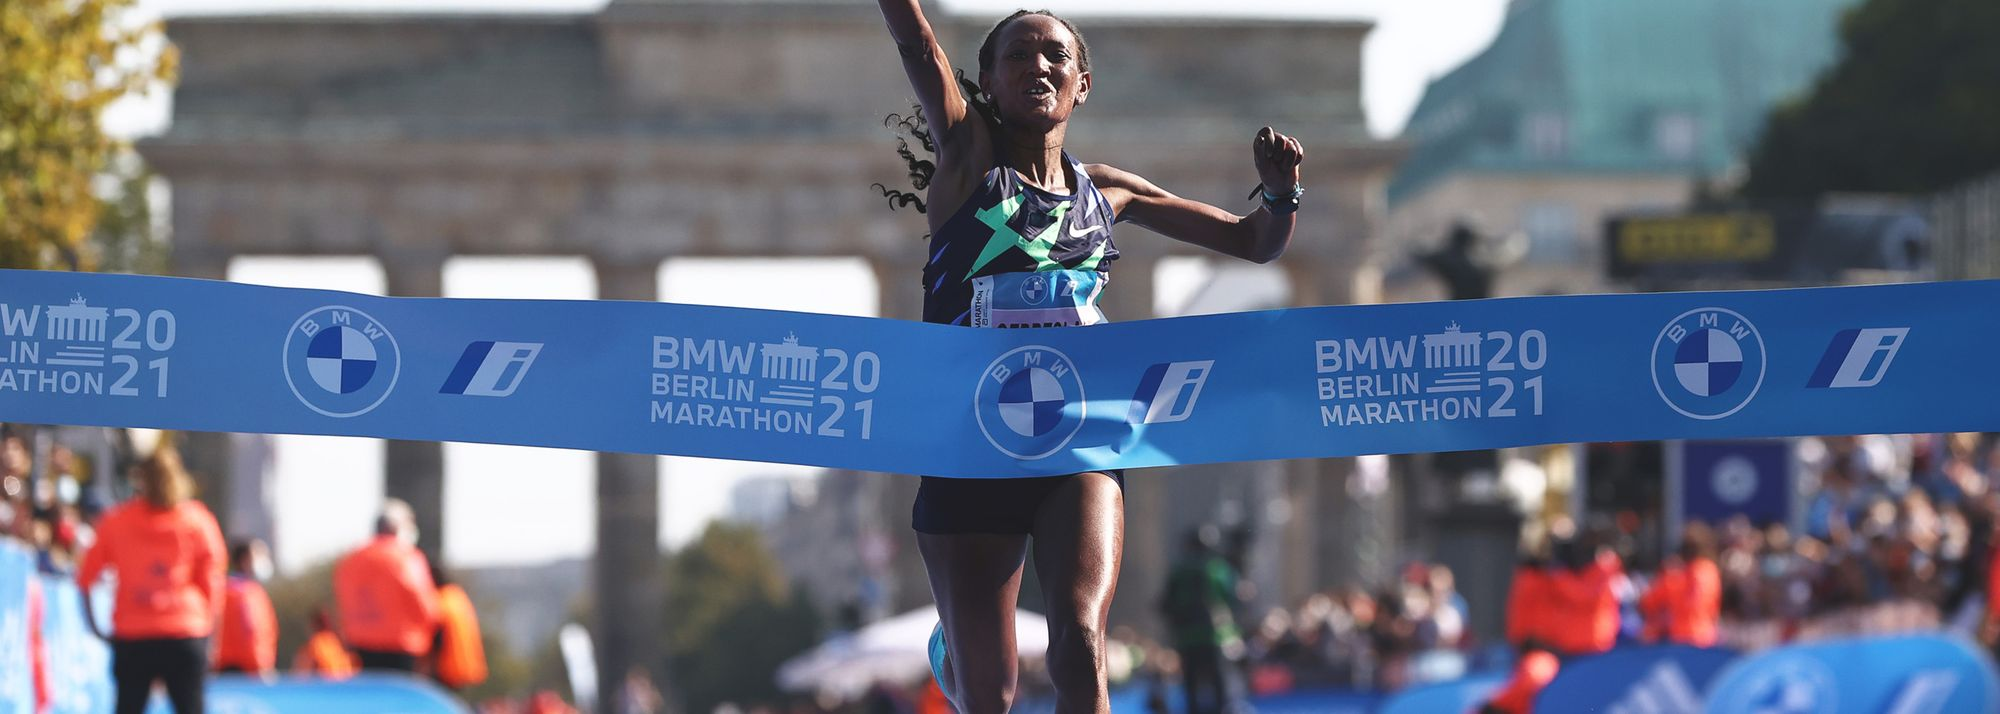 Gotytom Gebreslase (2:20:09) and Guye Adola (2:05:45) secure Ethiopian double